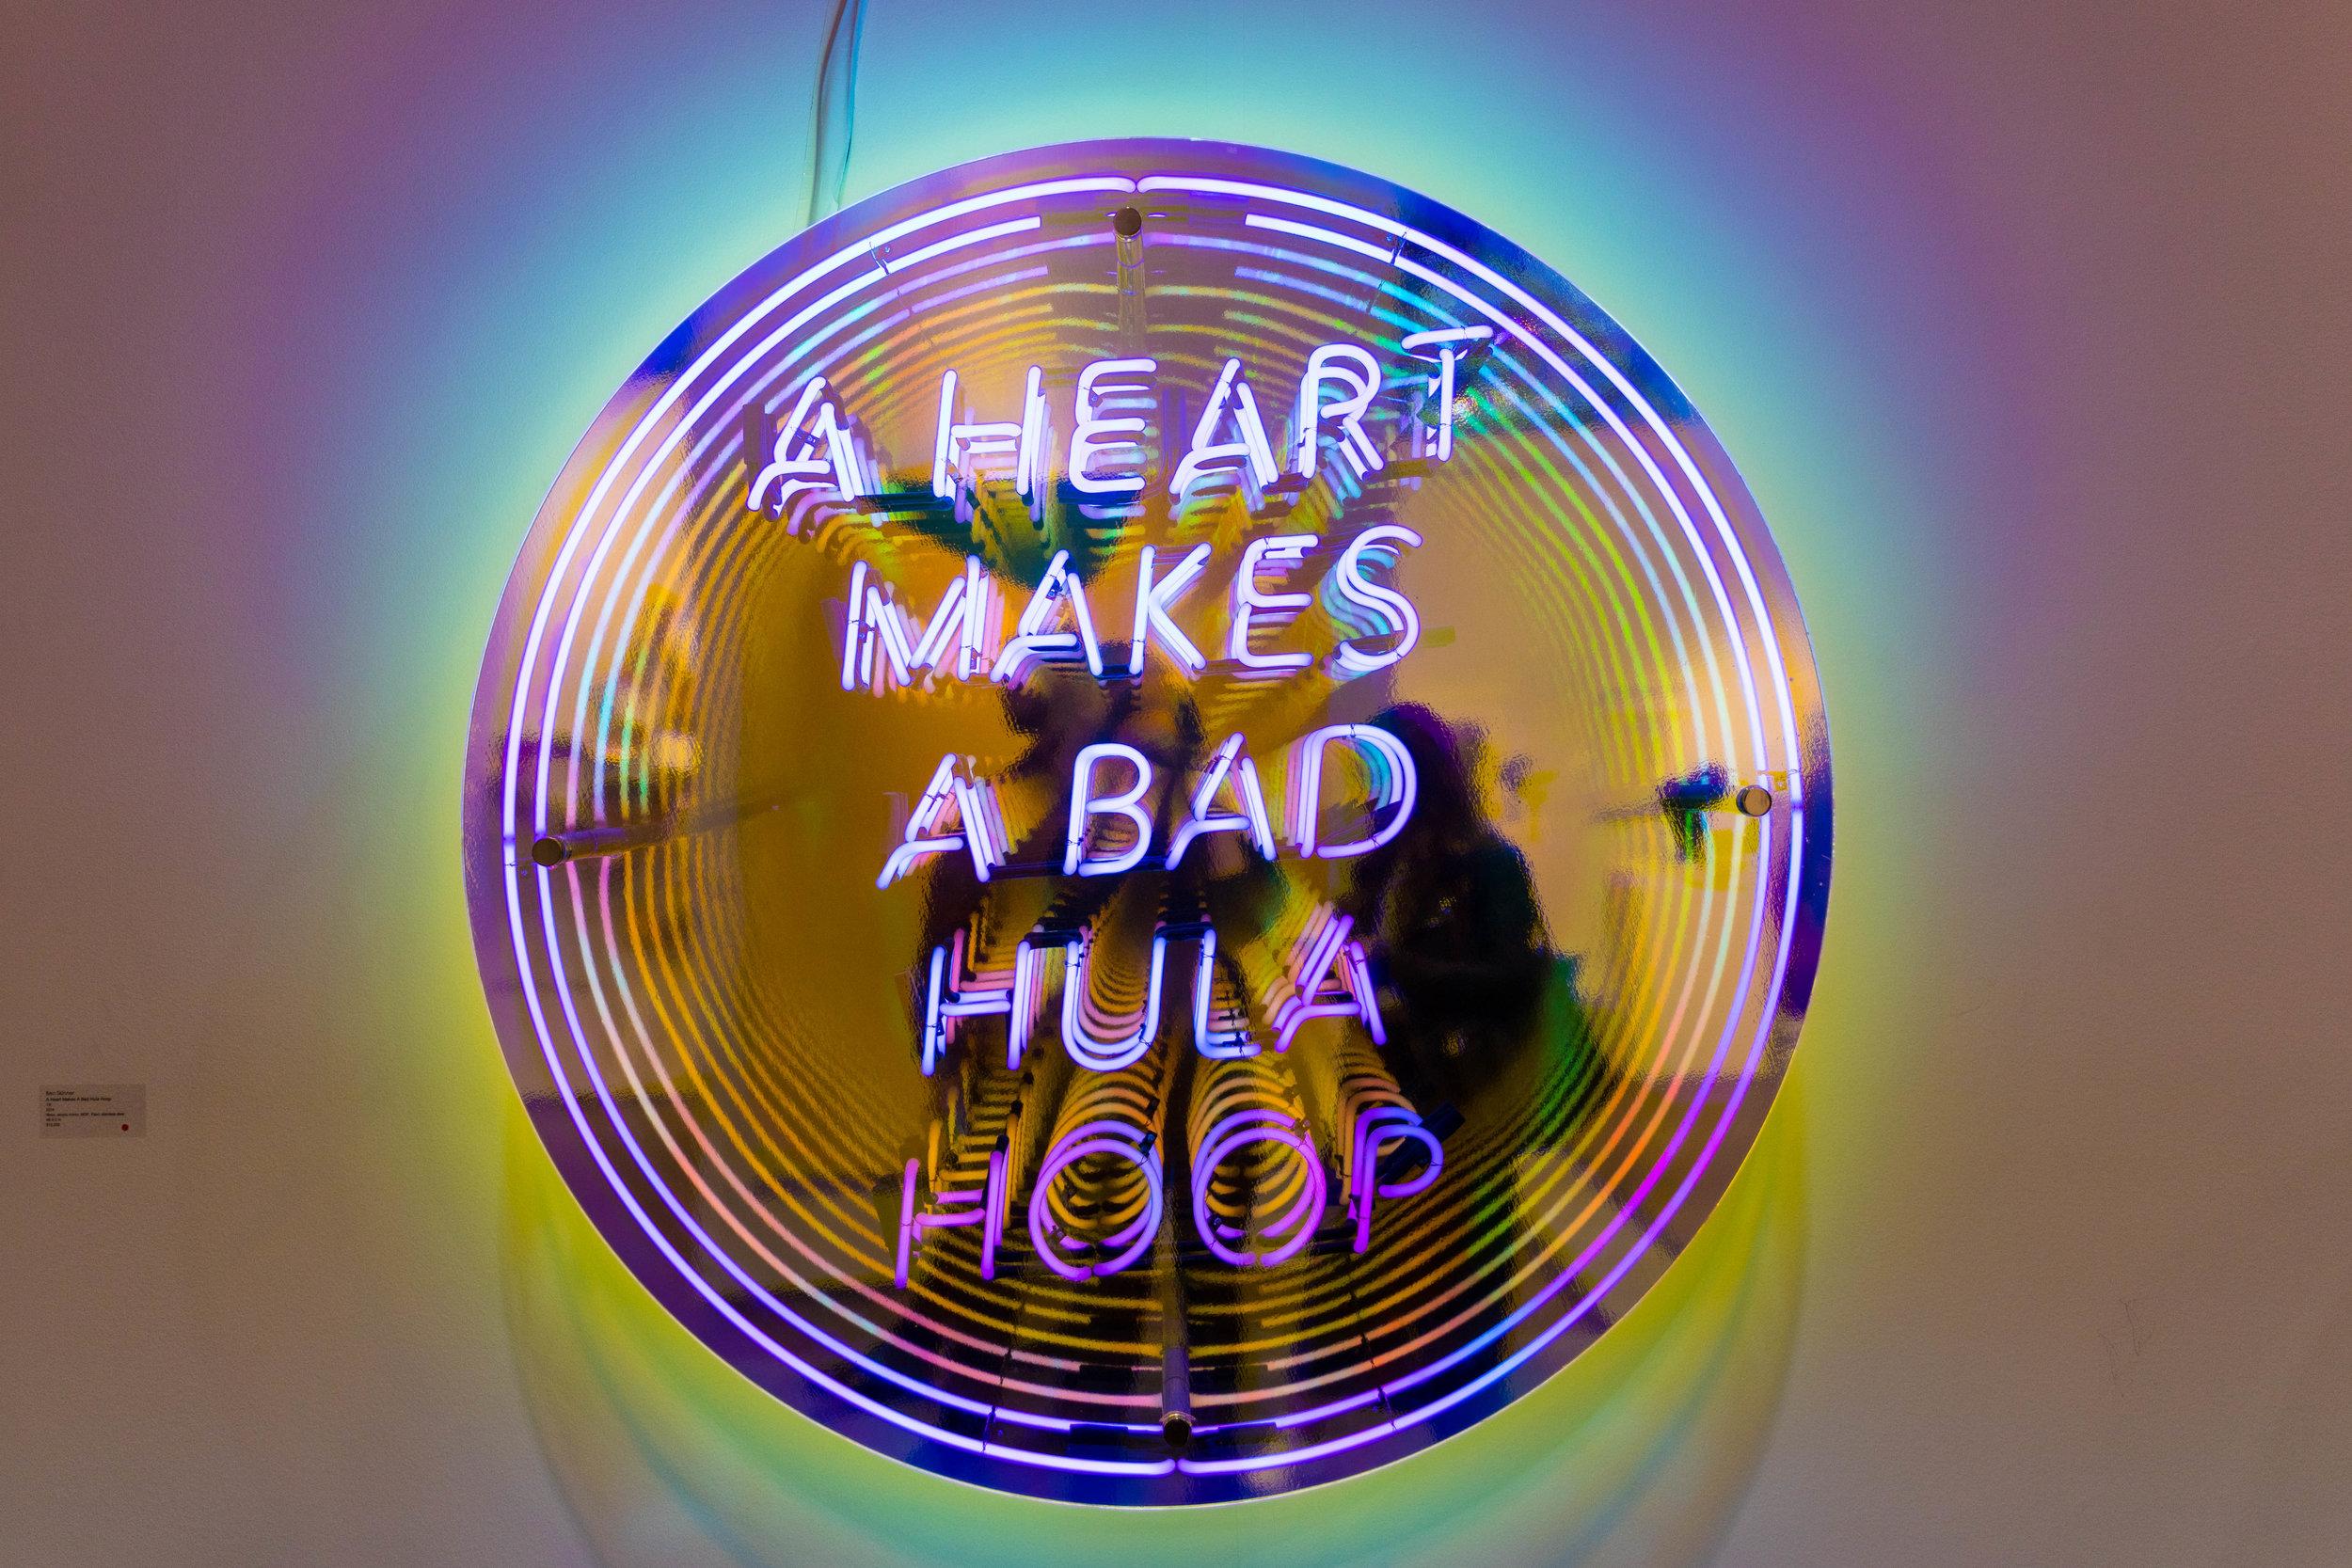 A Heart Makes a Bad Hula Hoop , 2014  Ben Skinner